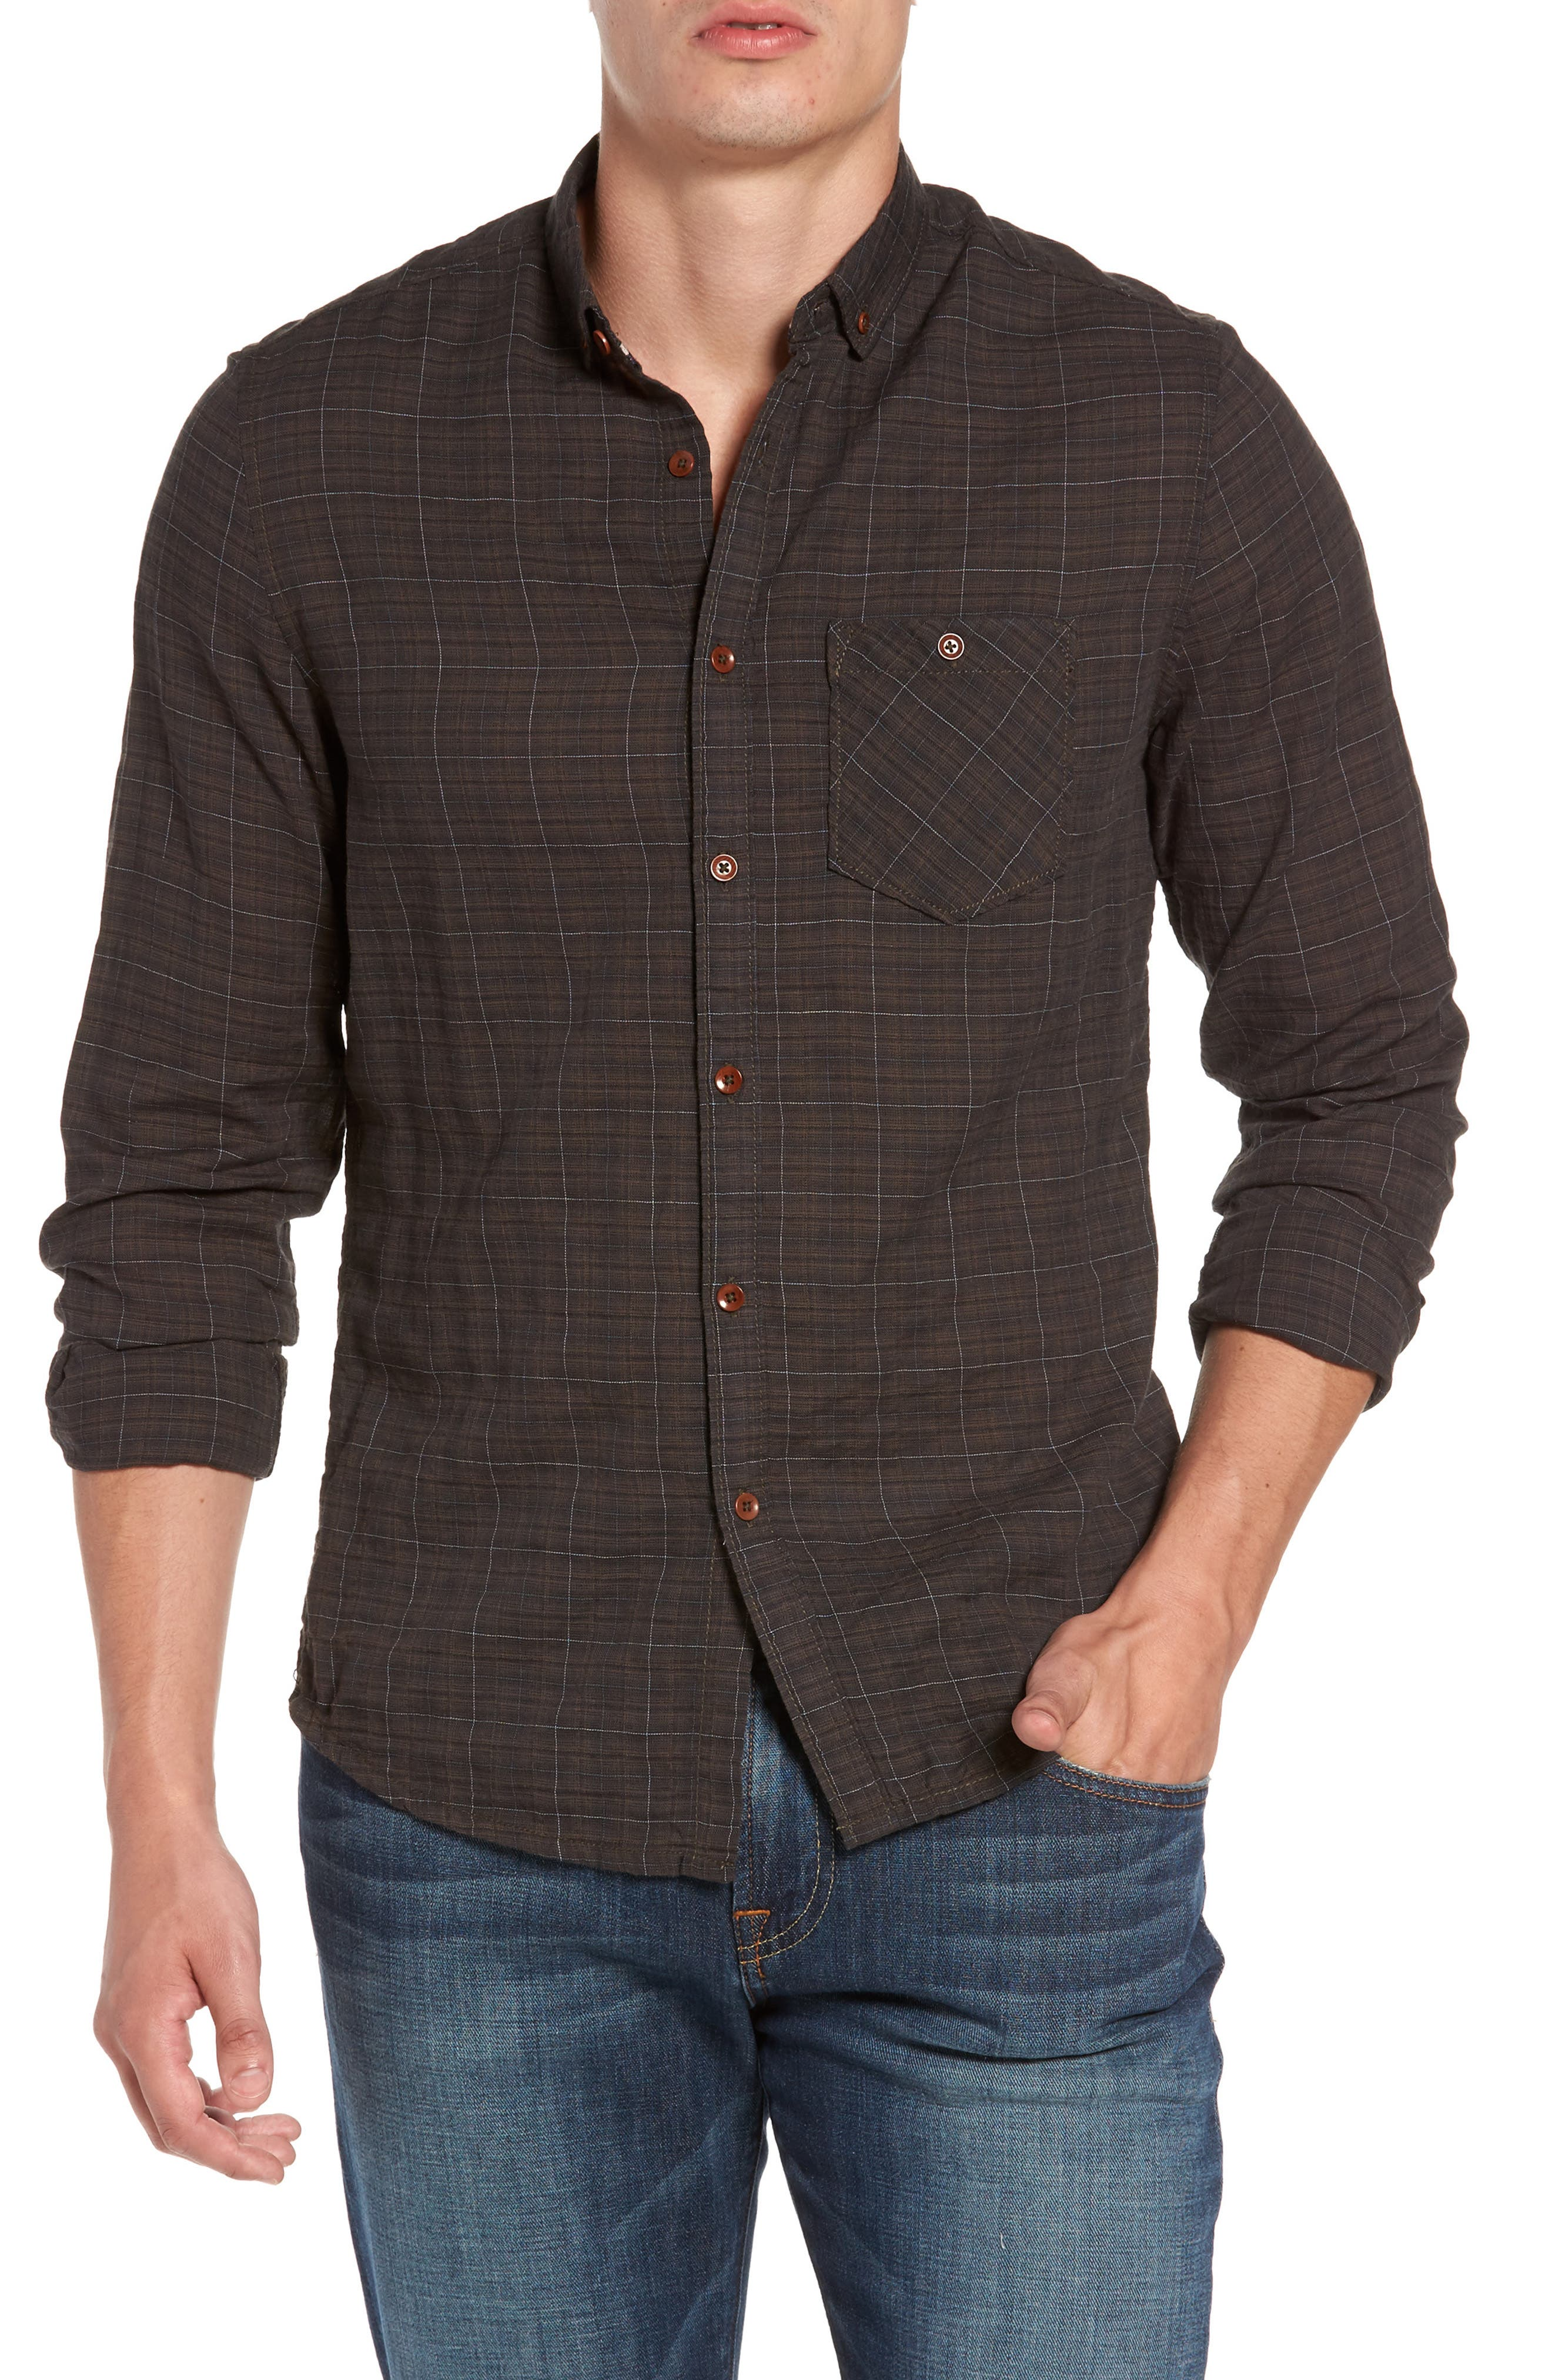 Molera Pucker Plaid Sport Shirt,                         Main,                         color, 202